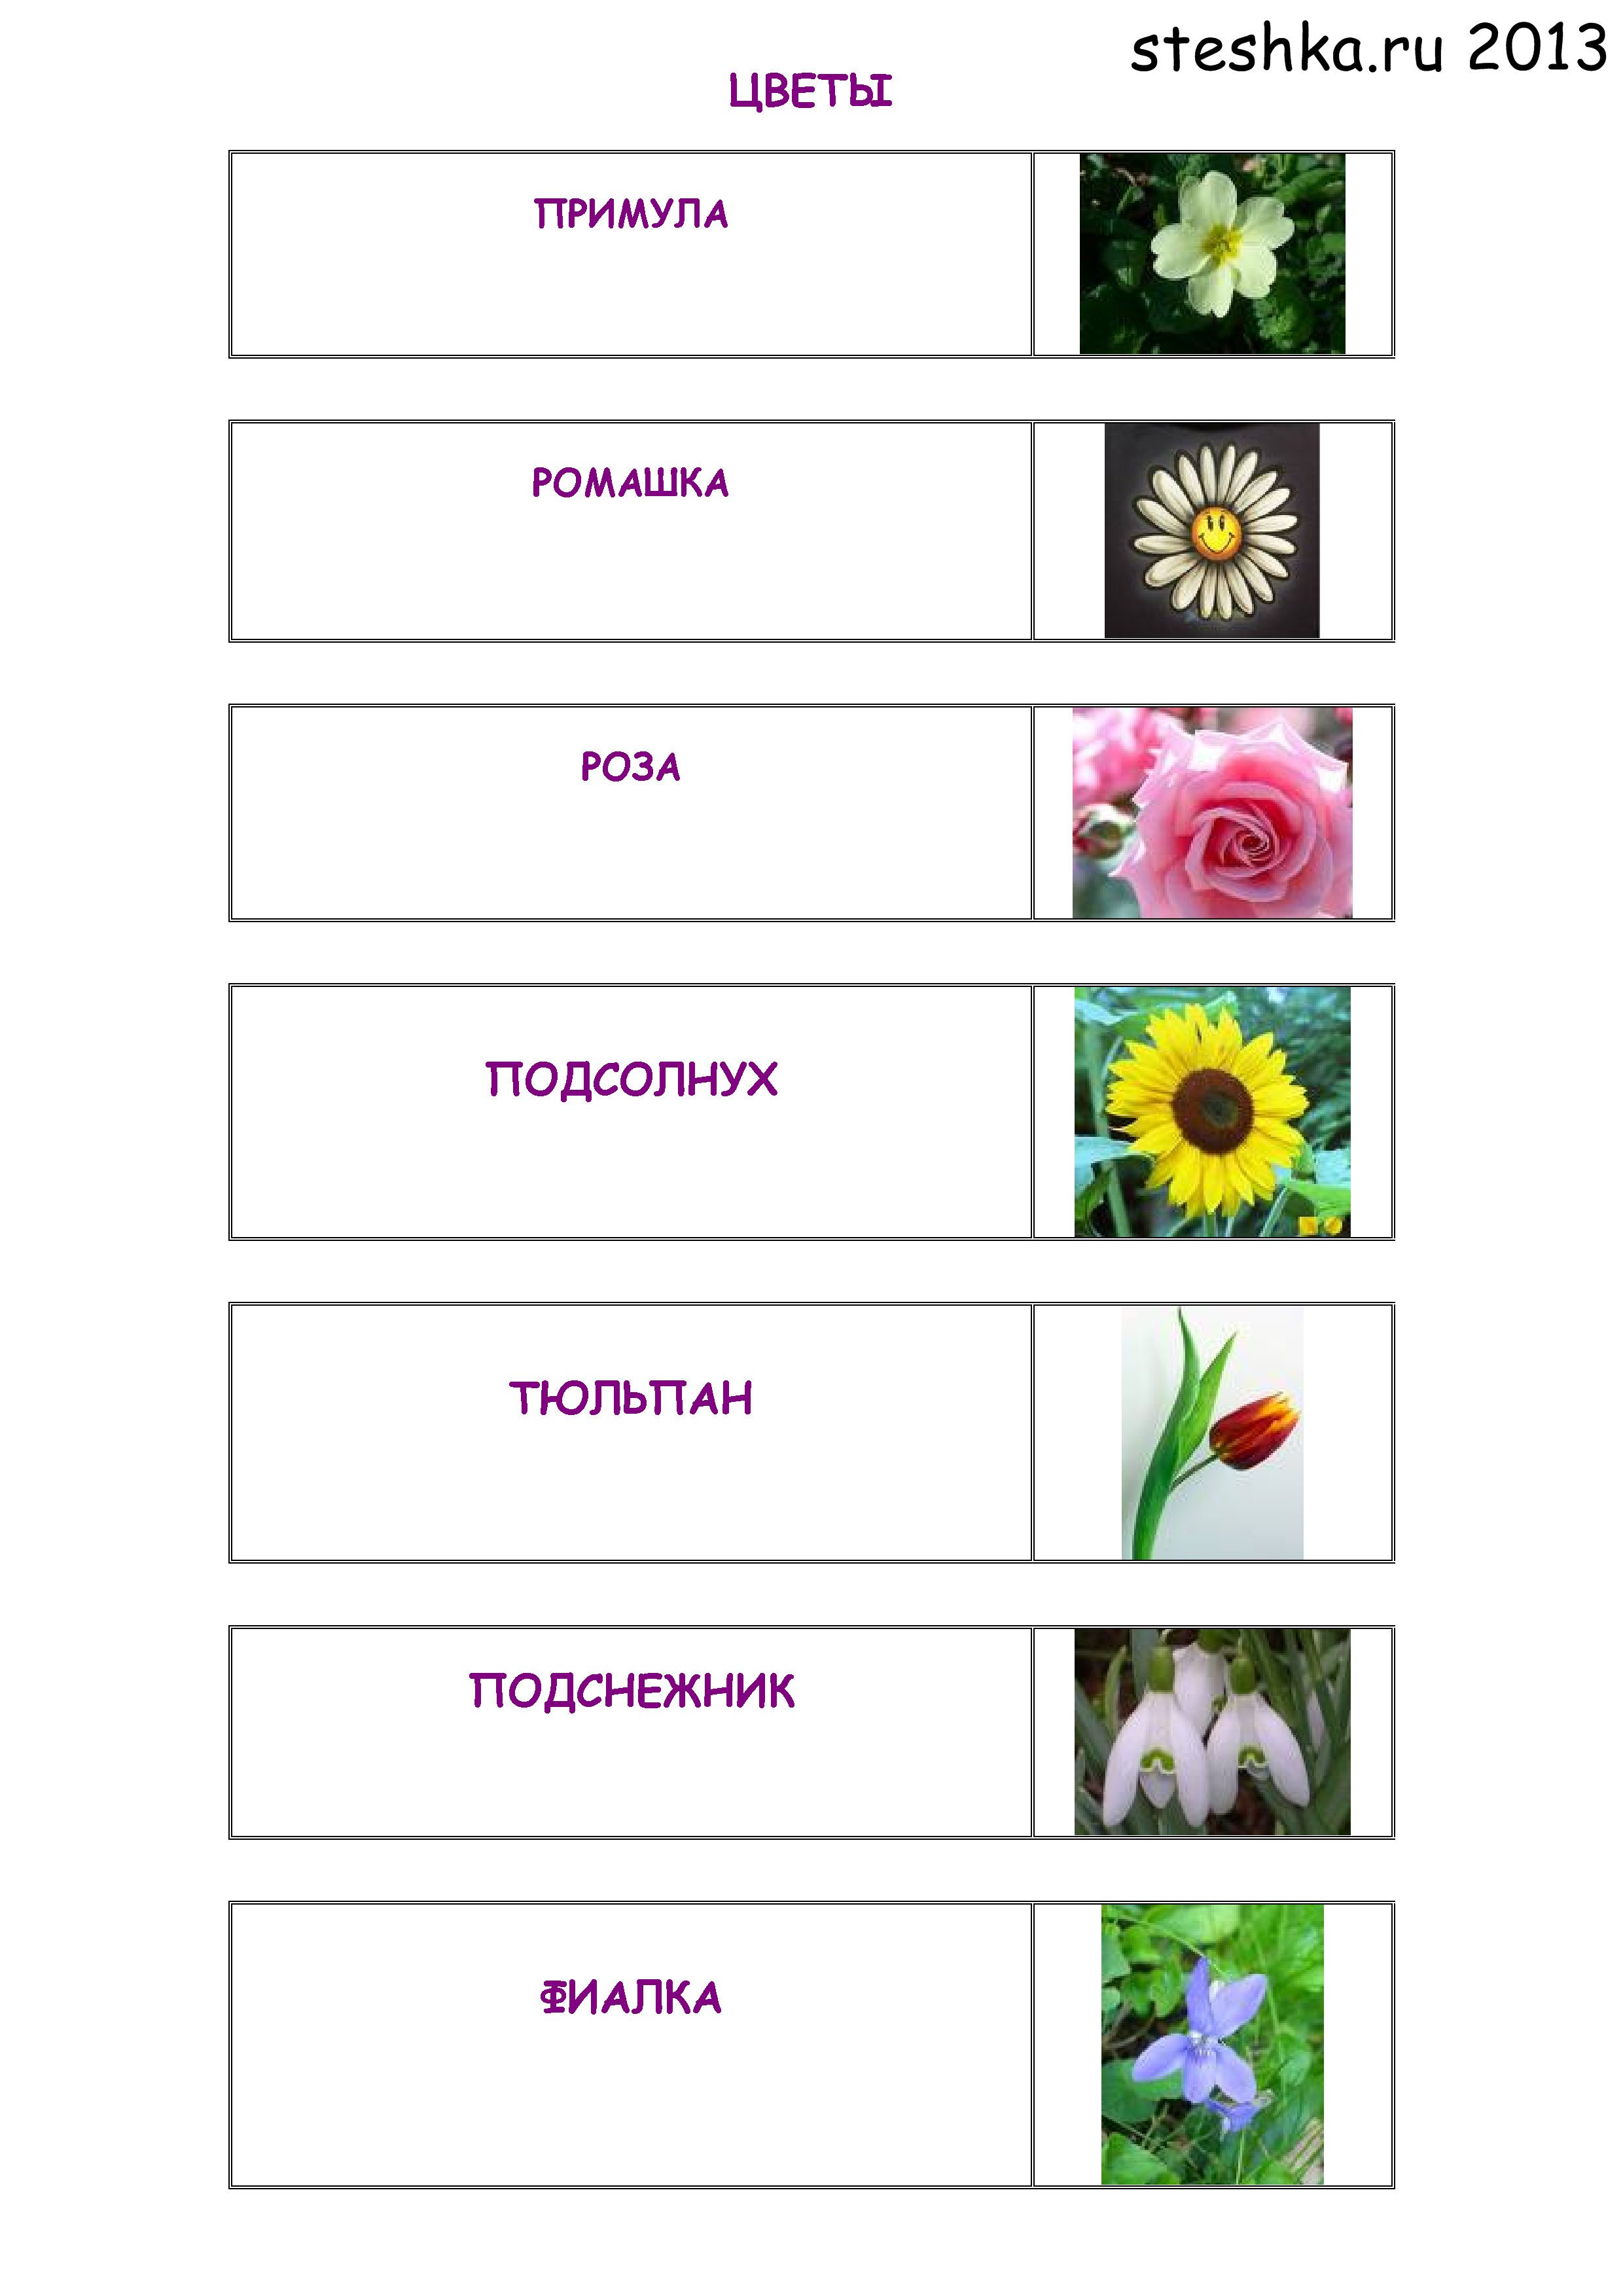 Название цветов по алфавиту фото и растений